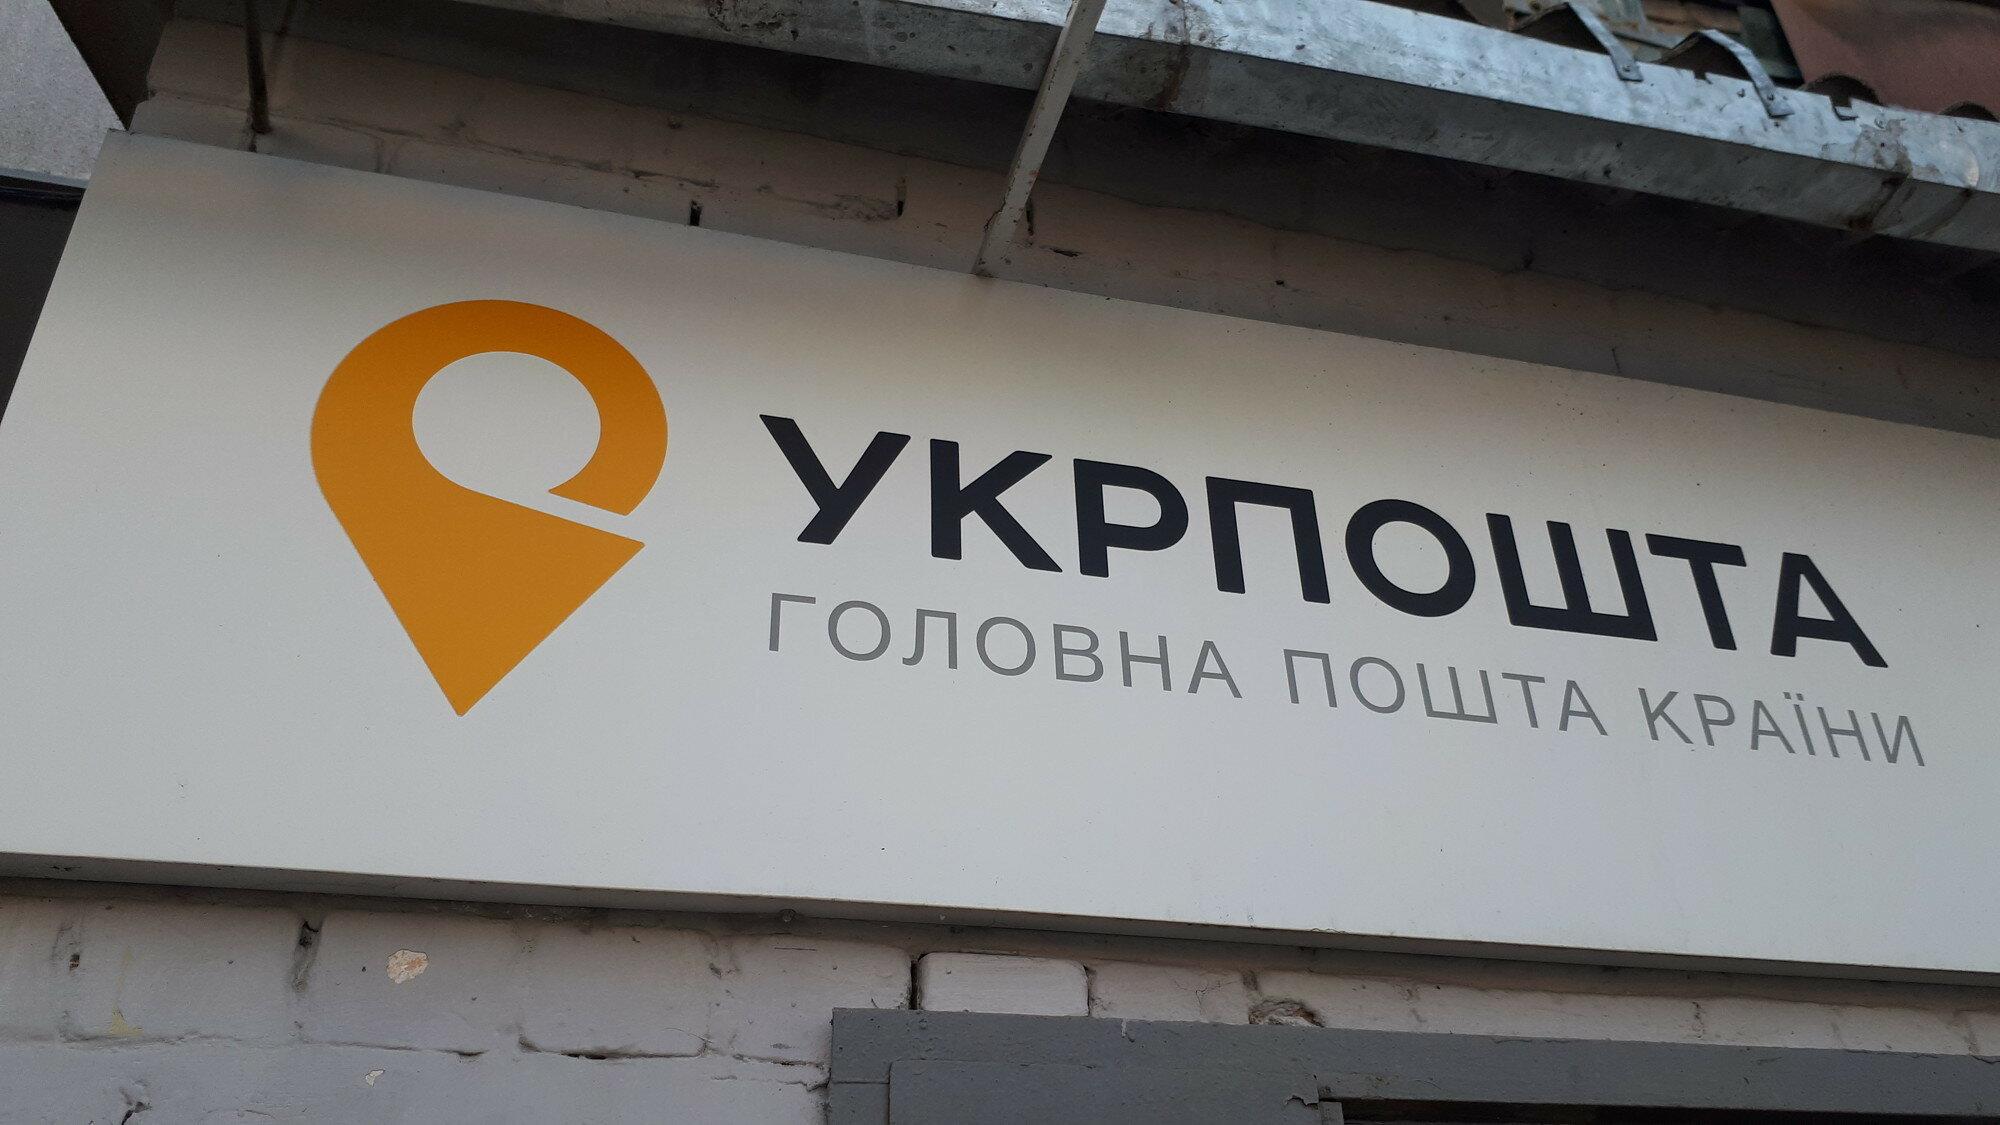 Укрпошта открыла подписку на газеты и журналы